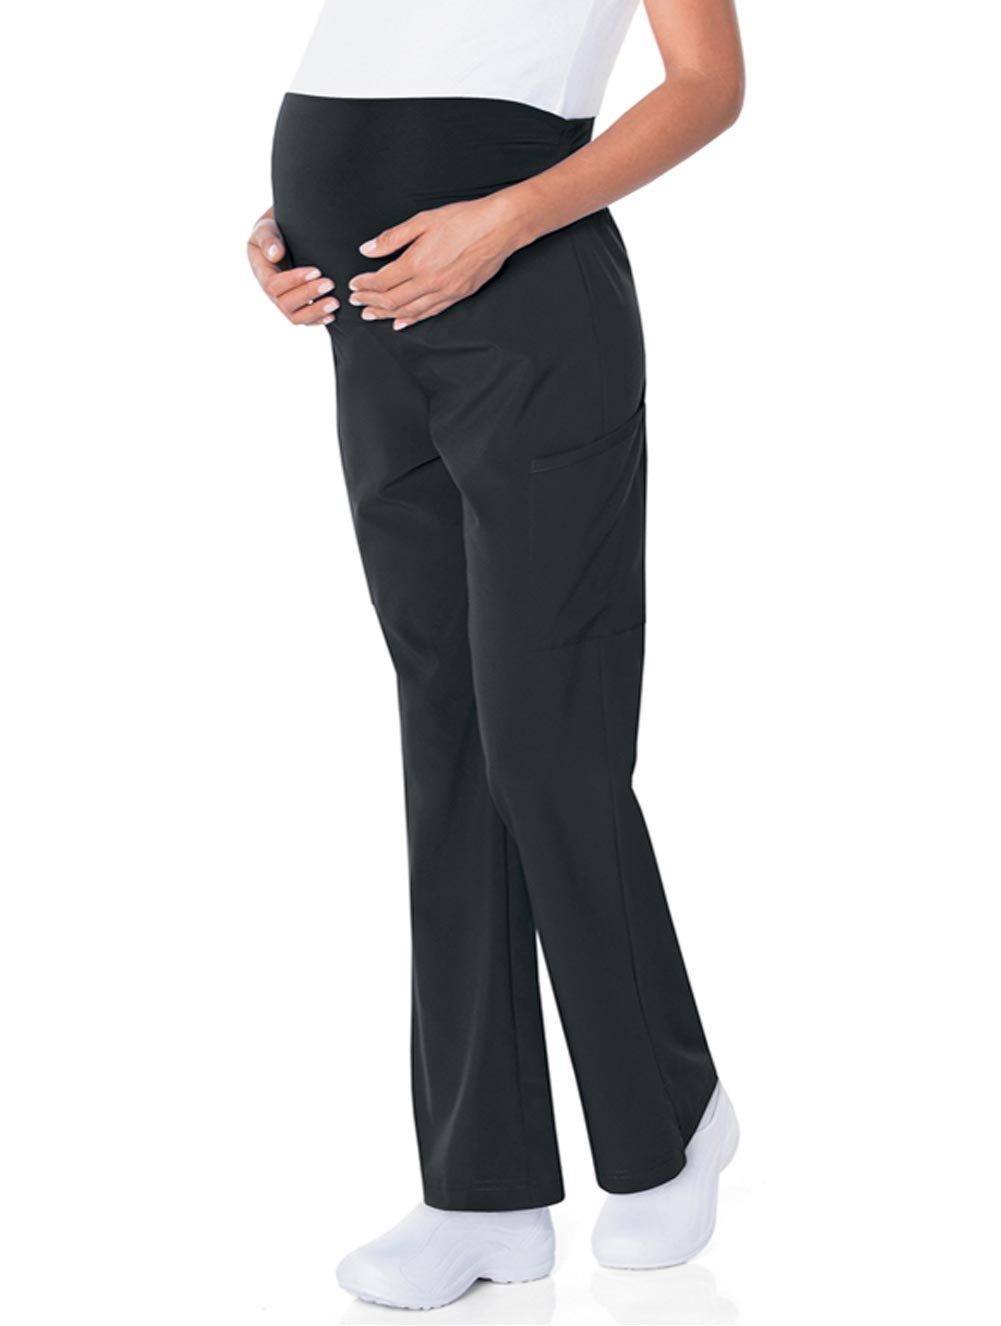 Women's Maternity Bootcut Pant